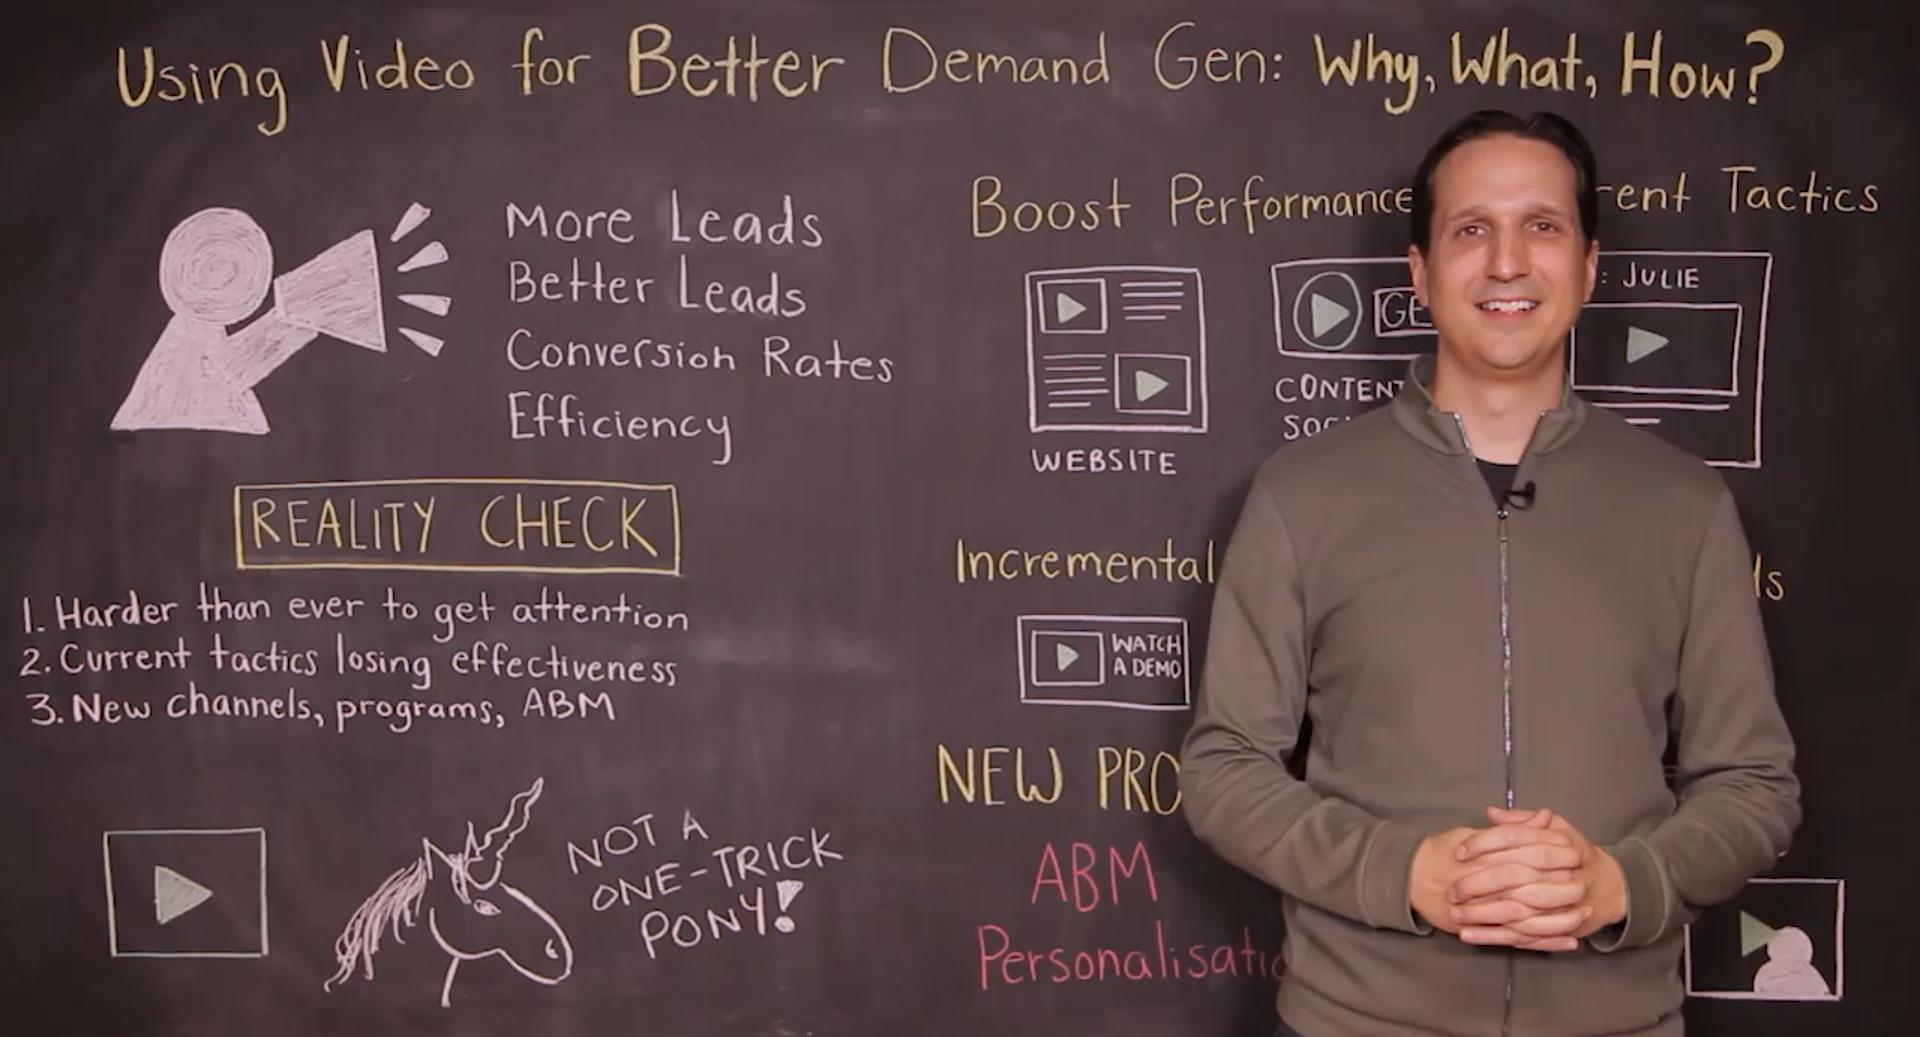 Vidyard Chalk Talk Using Video for Better Demand Generation